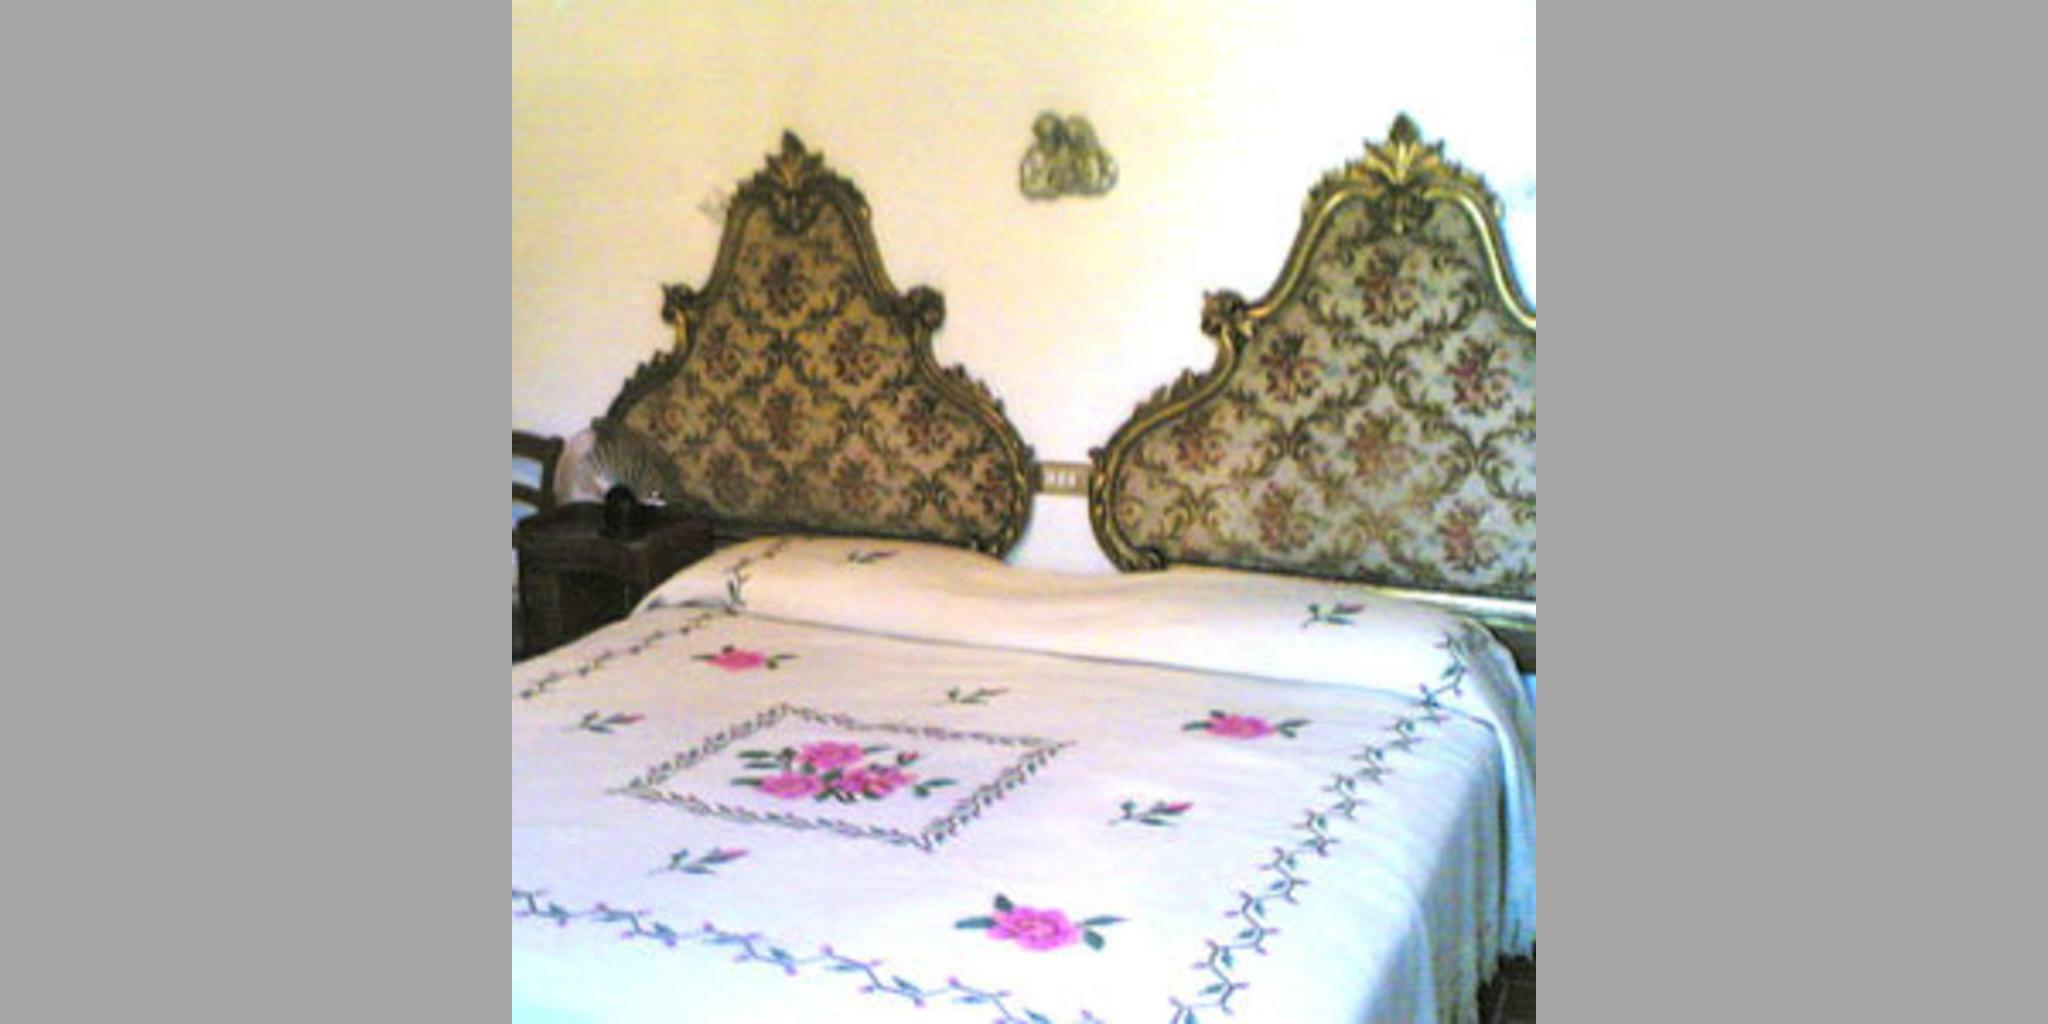 Bed & Breakfast Controguerra - San Fedele